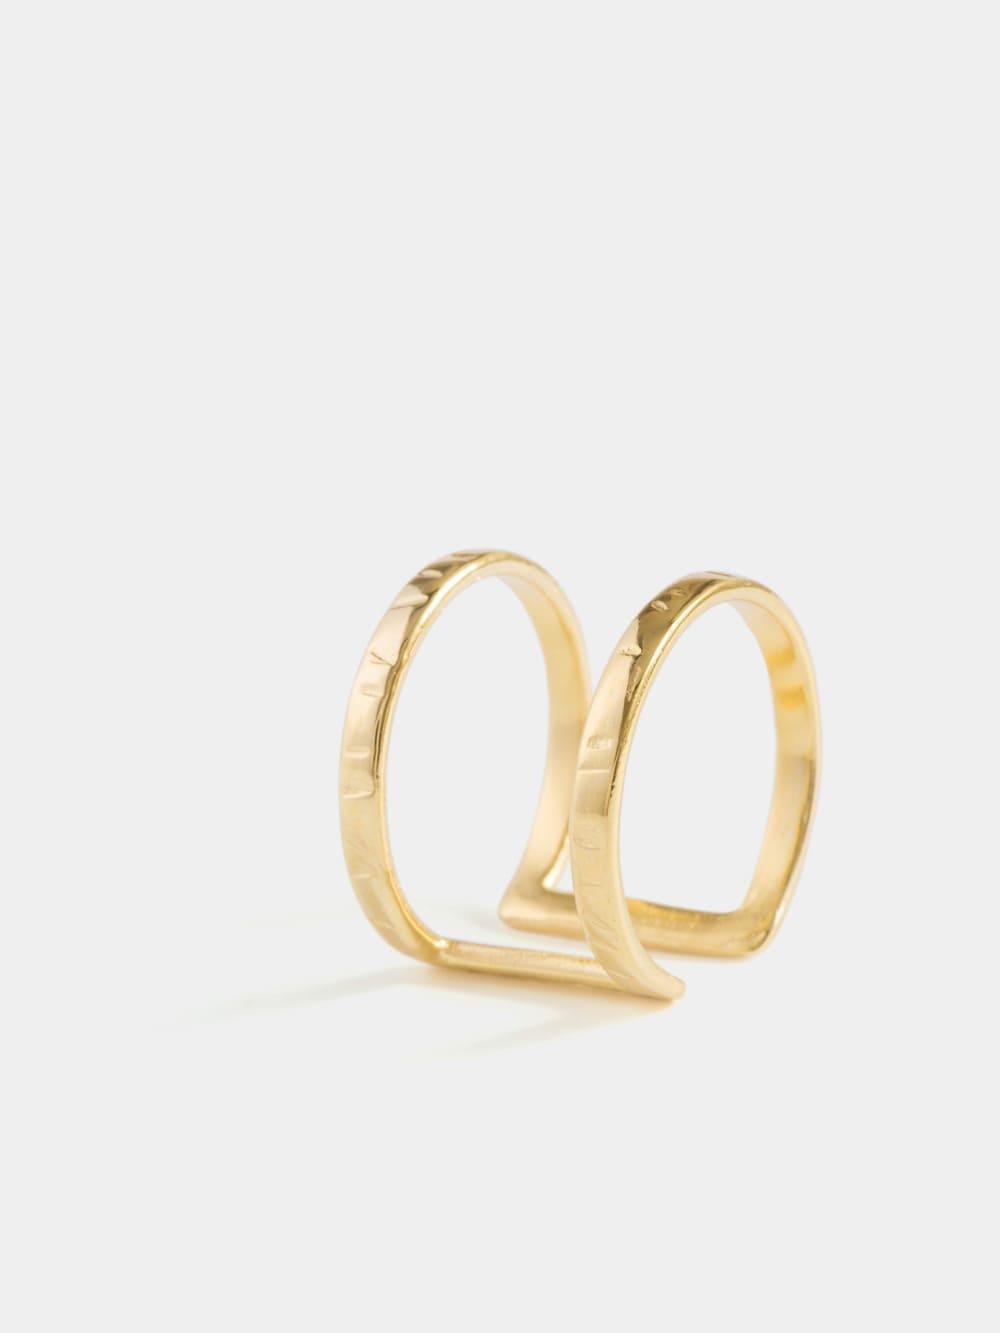 anillo de oro para chica, joyas para regalar a mi mejor amiga, comprar anillos de oro baratos para regalo, joyas marteliè barcelona, joyasmarket